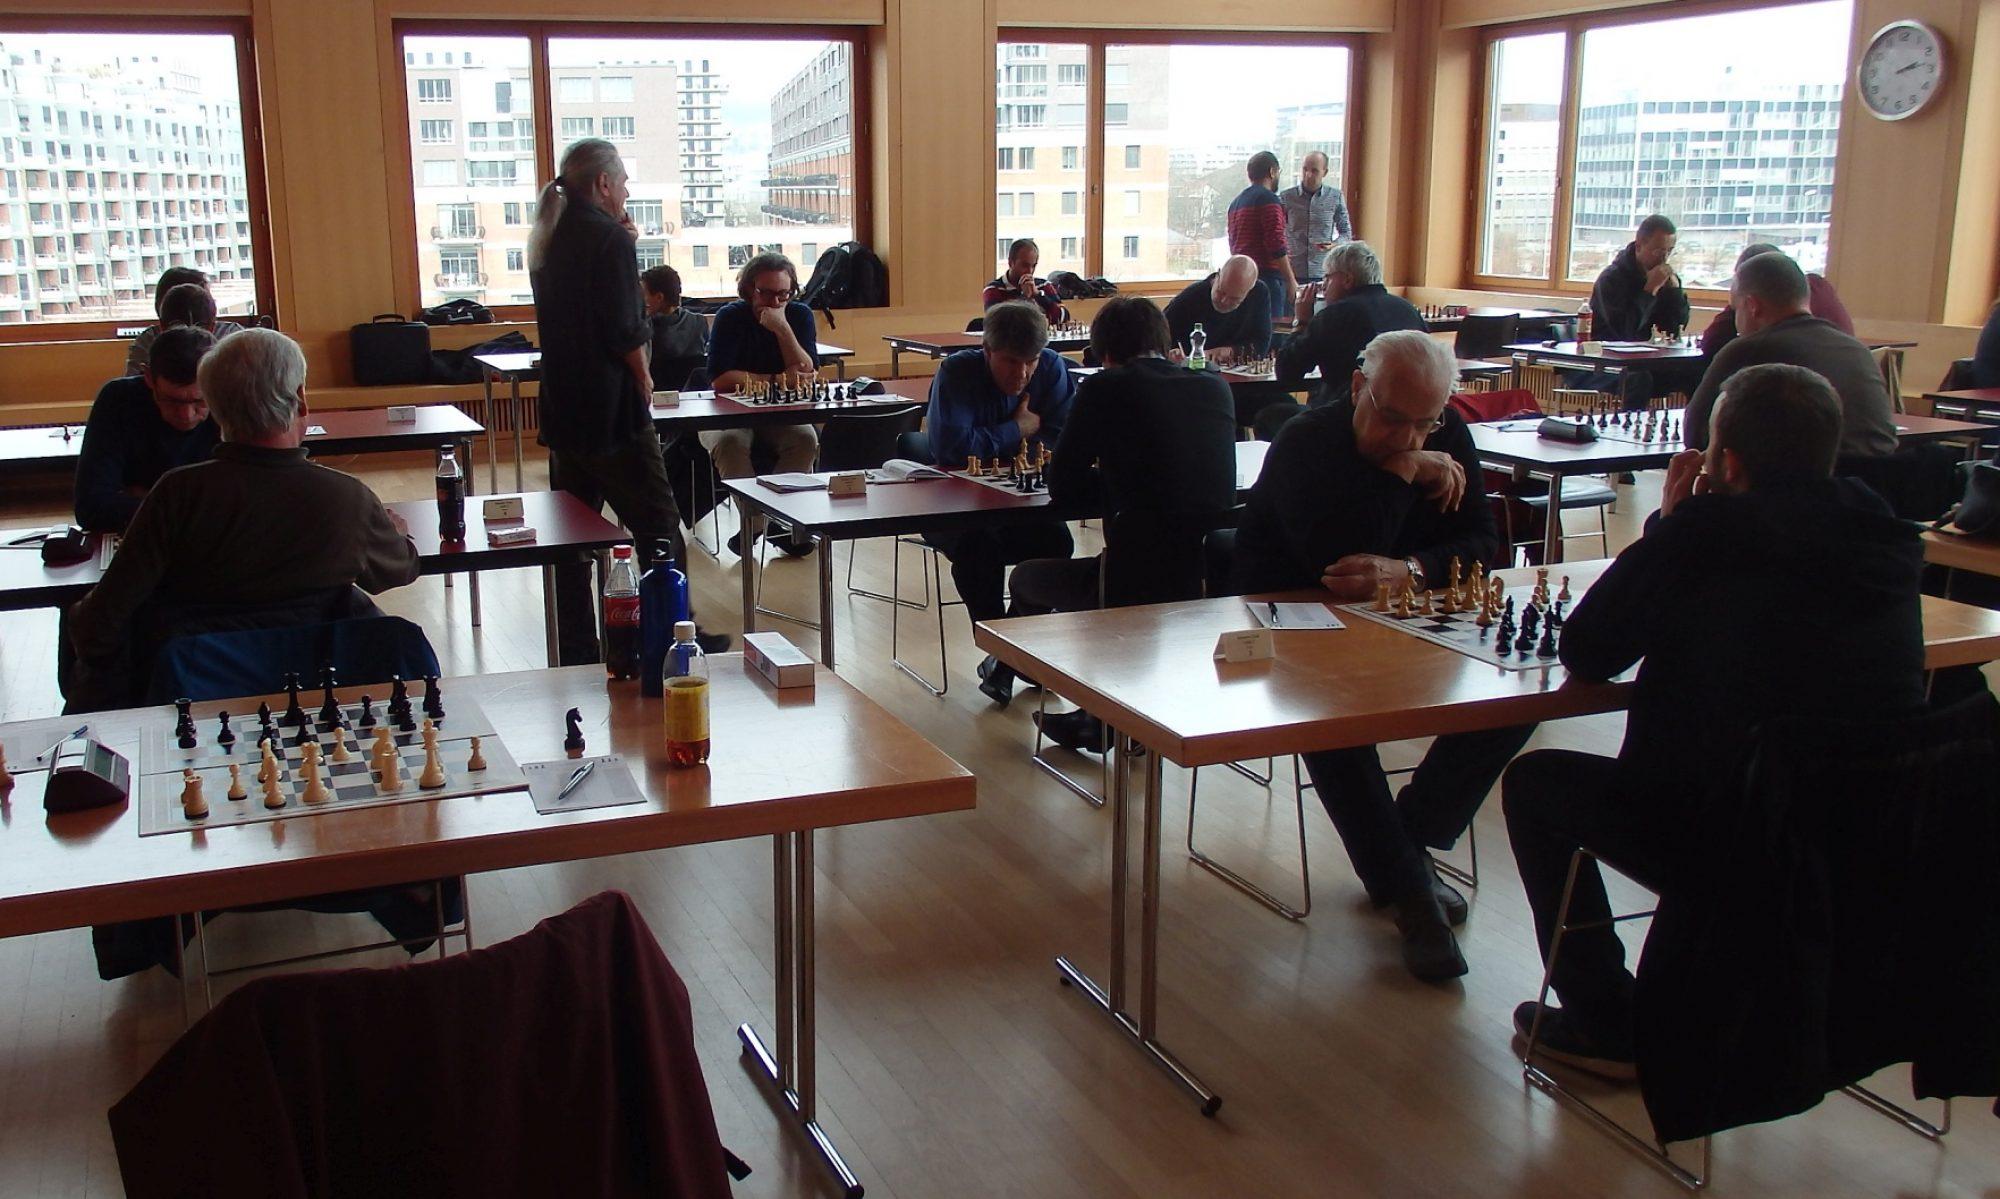 Schachclub Letzi